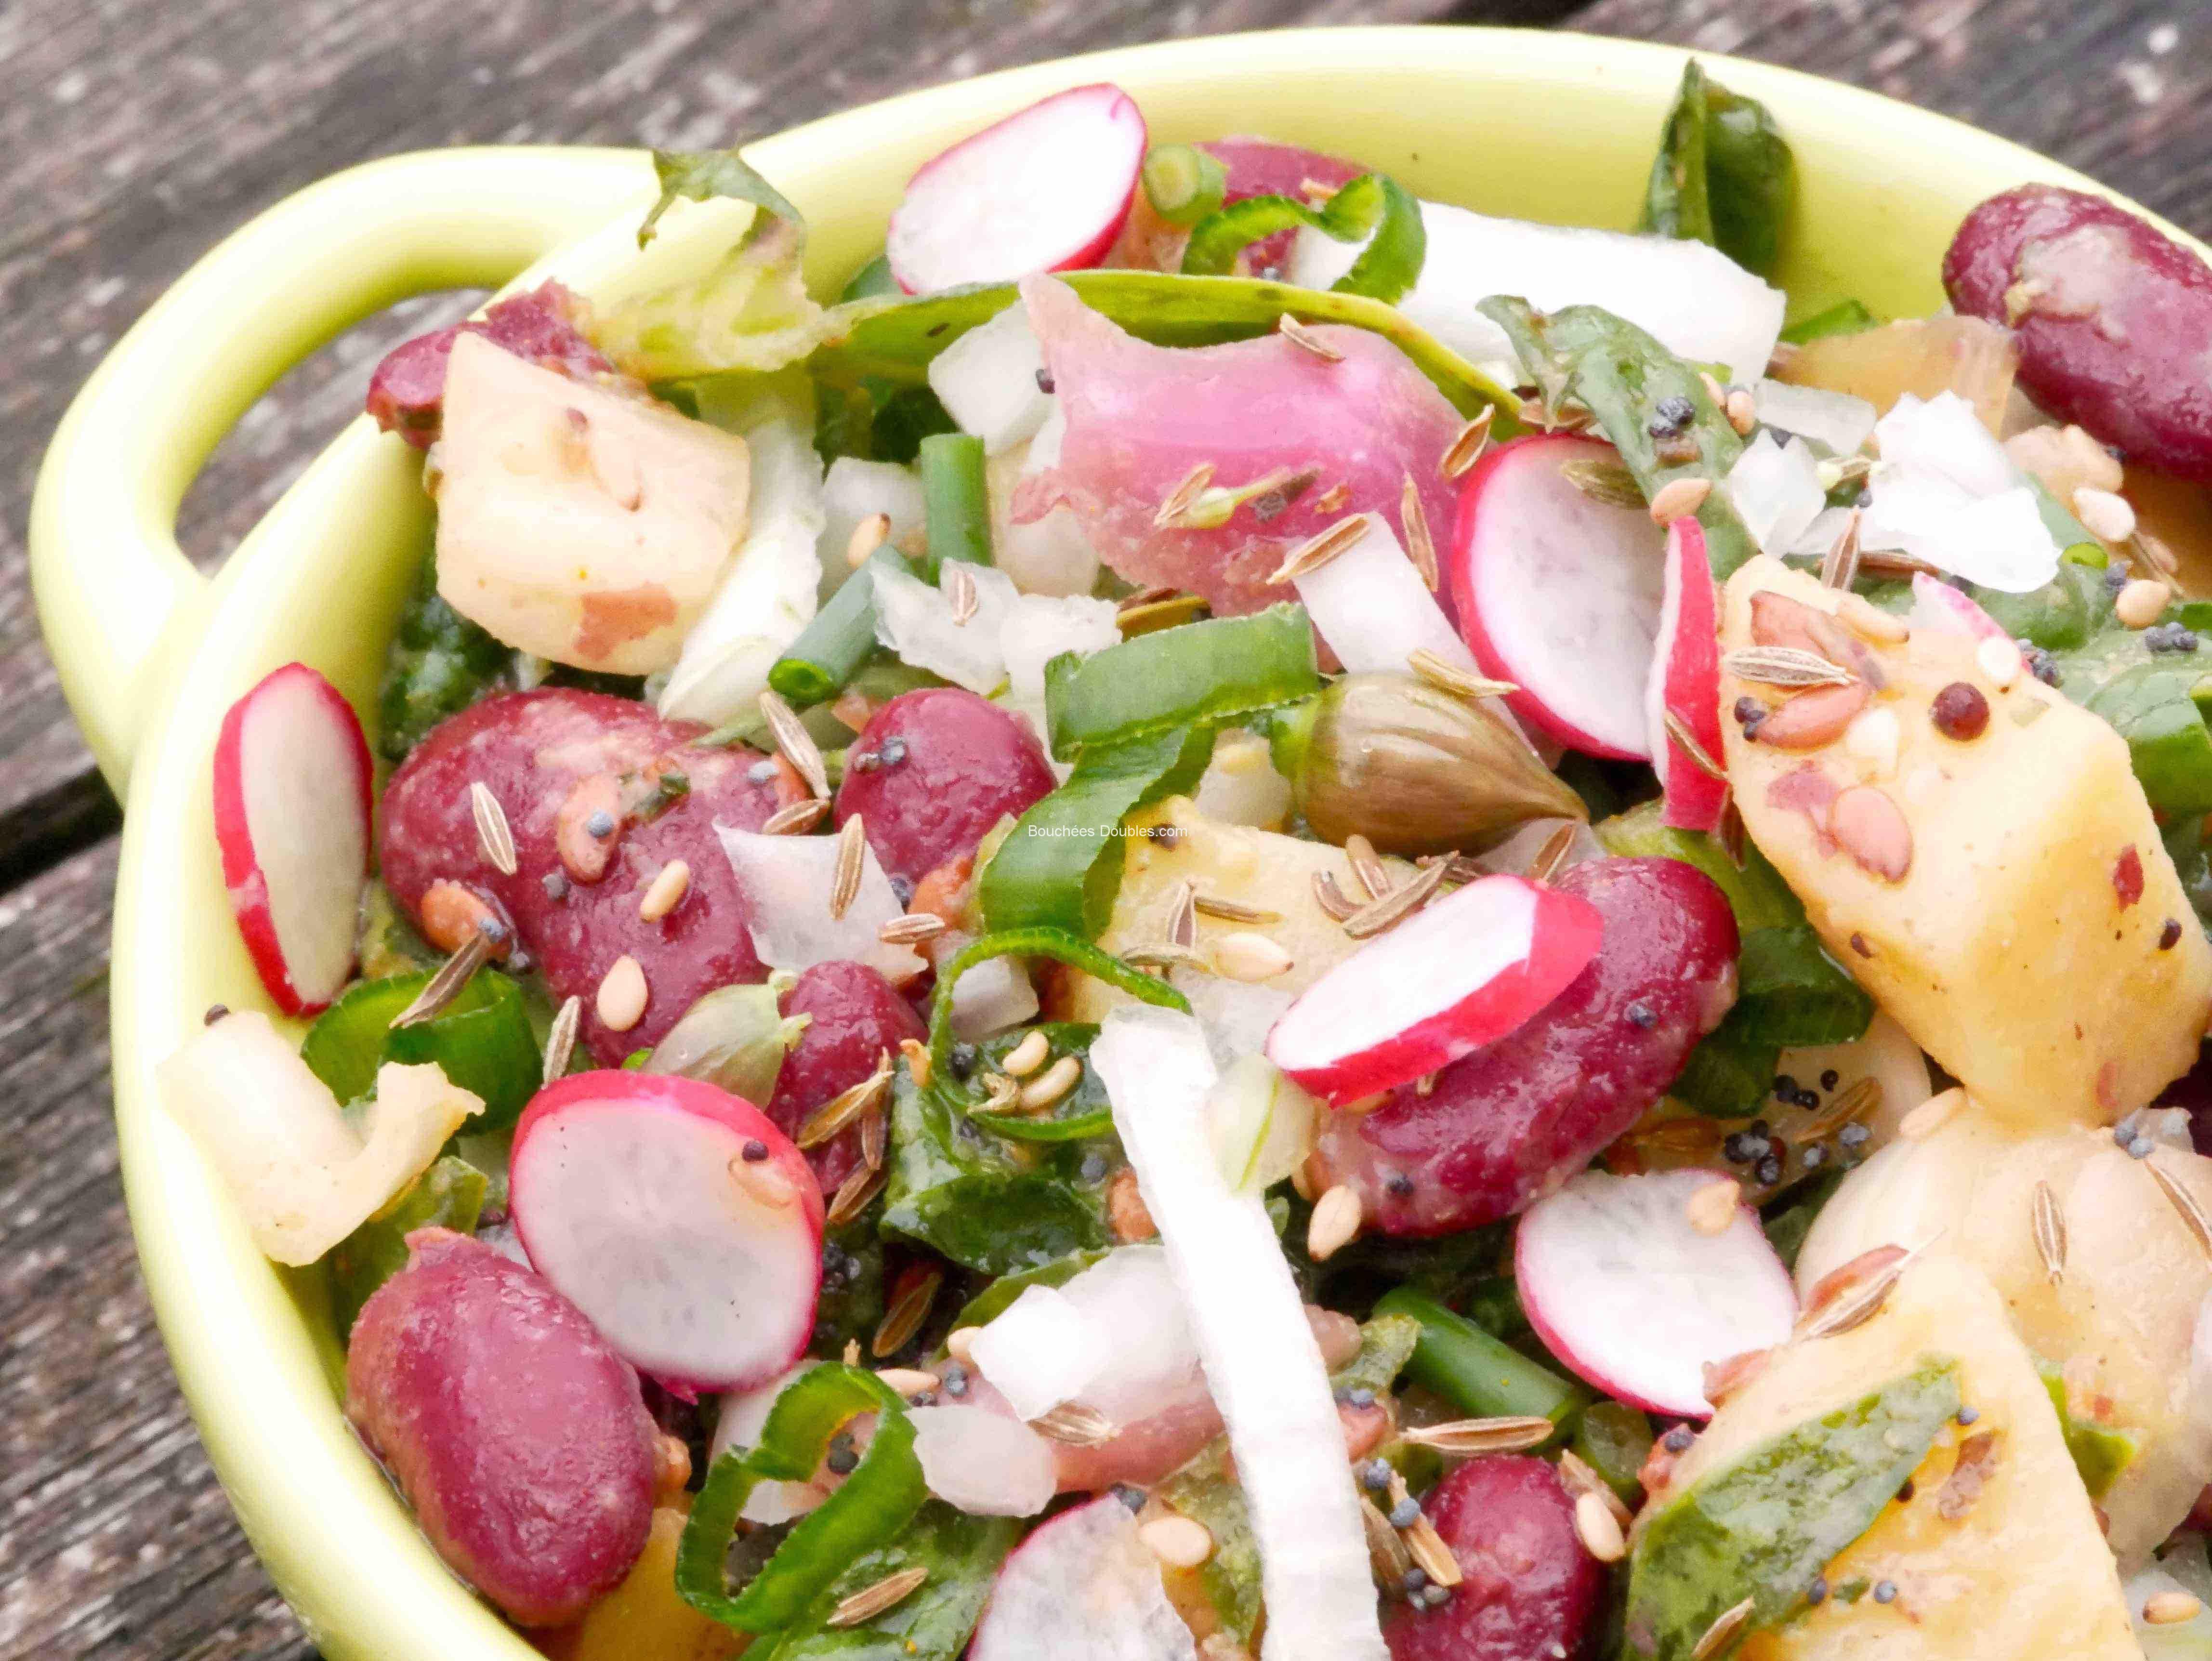 Salade Alcaline Composee Et Complete Facile Et Rapide Elle Caline